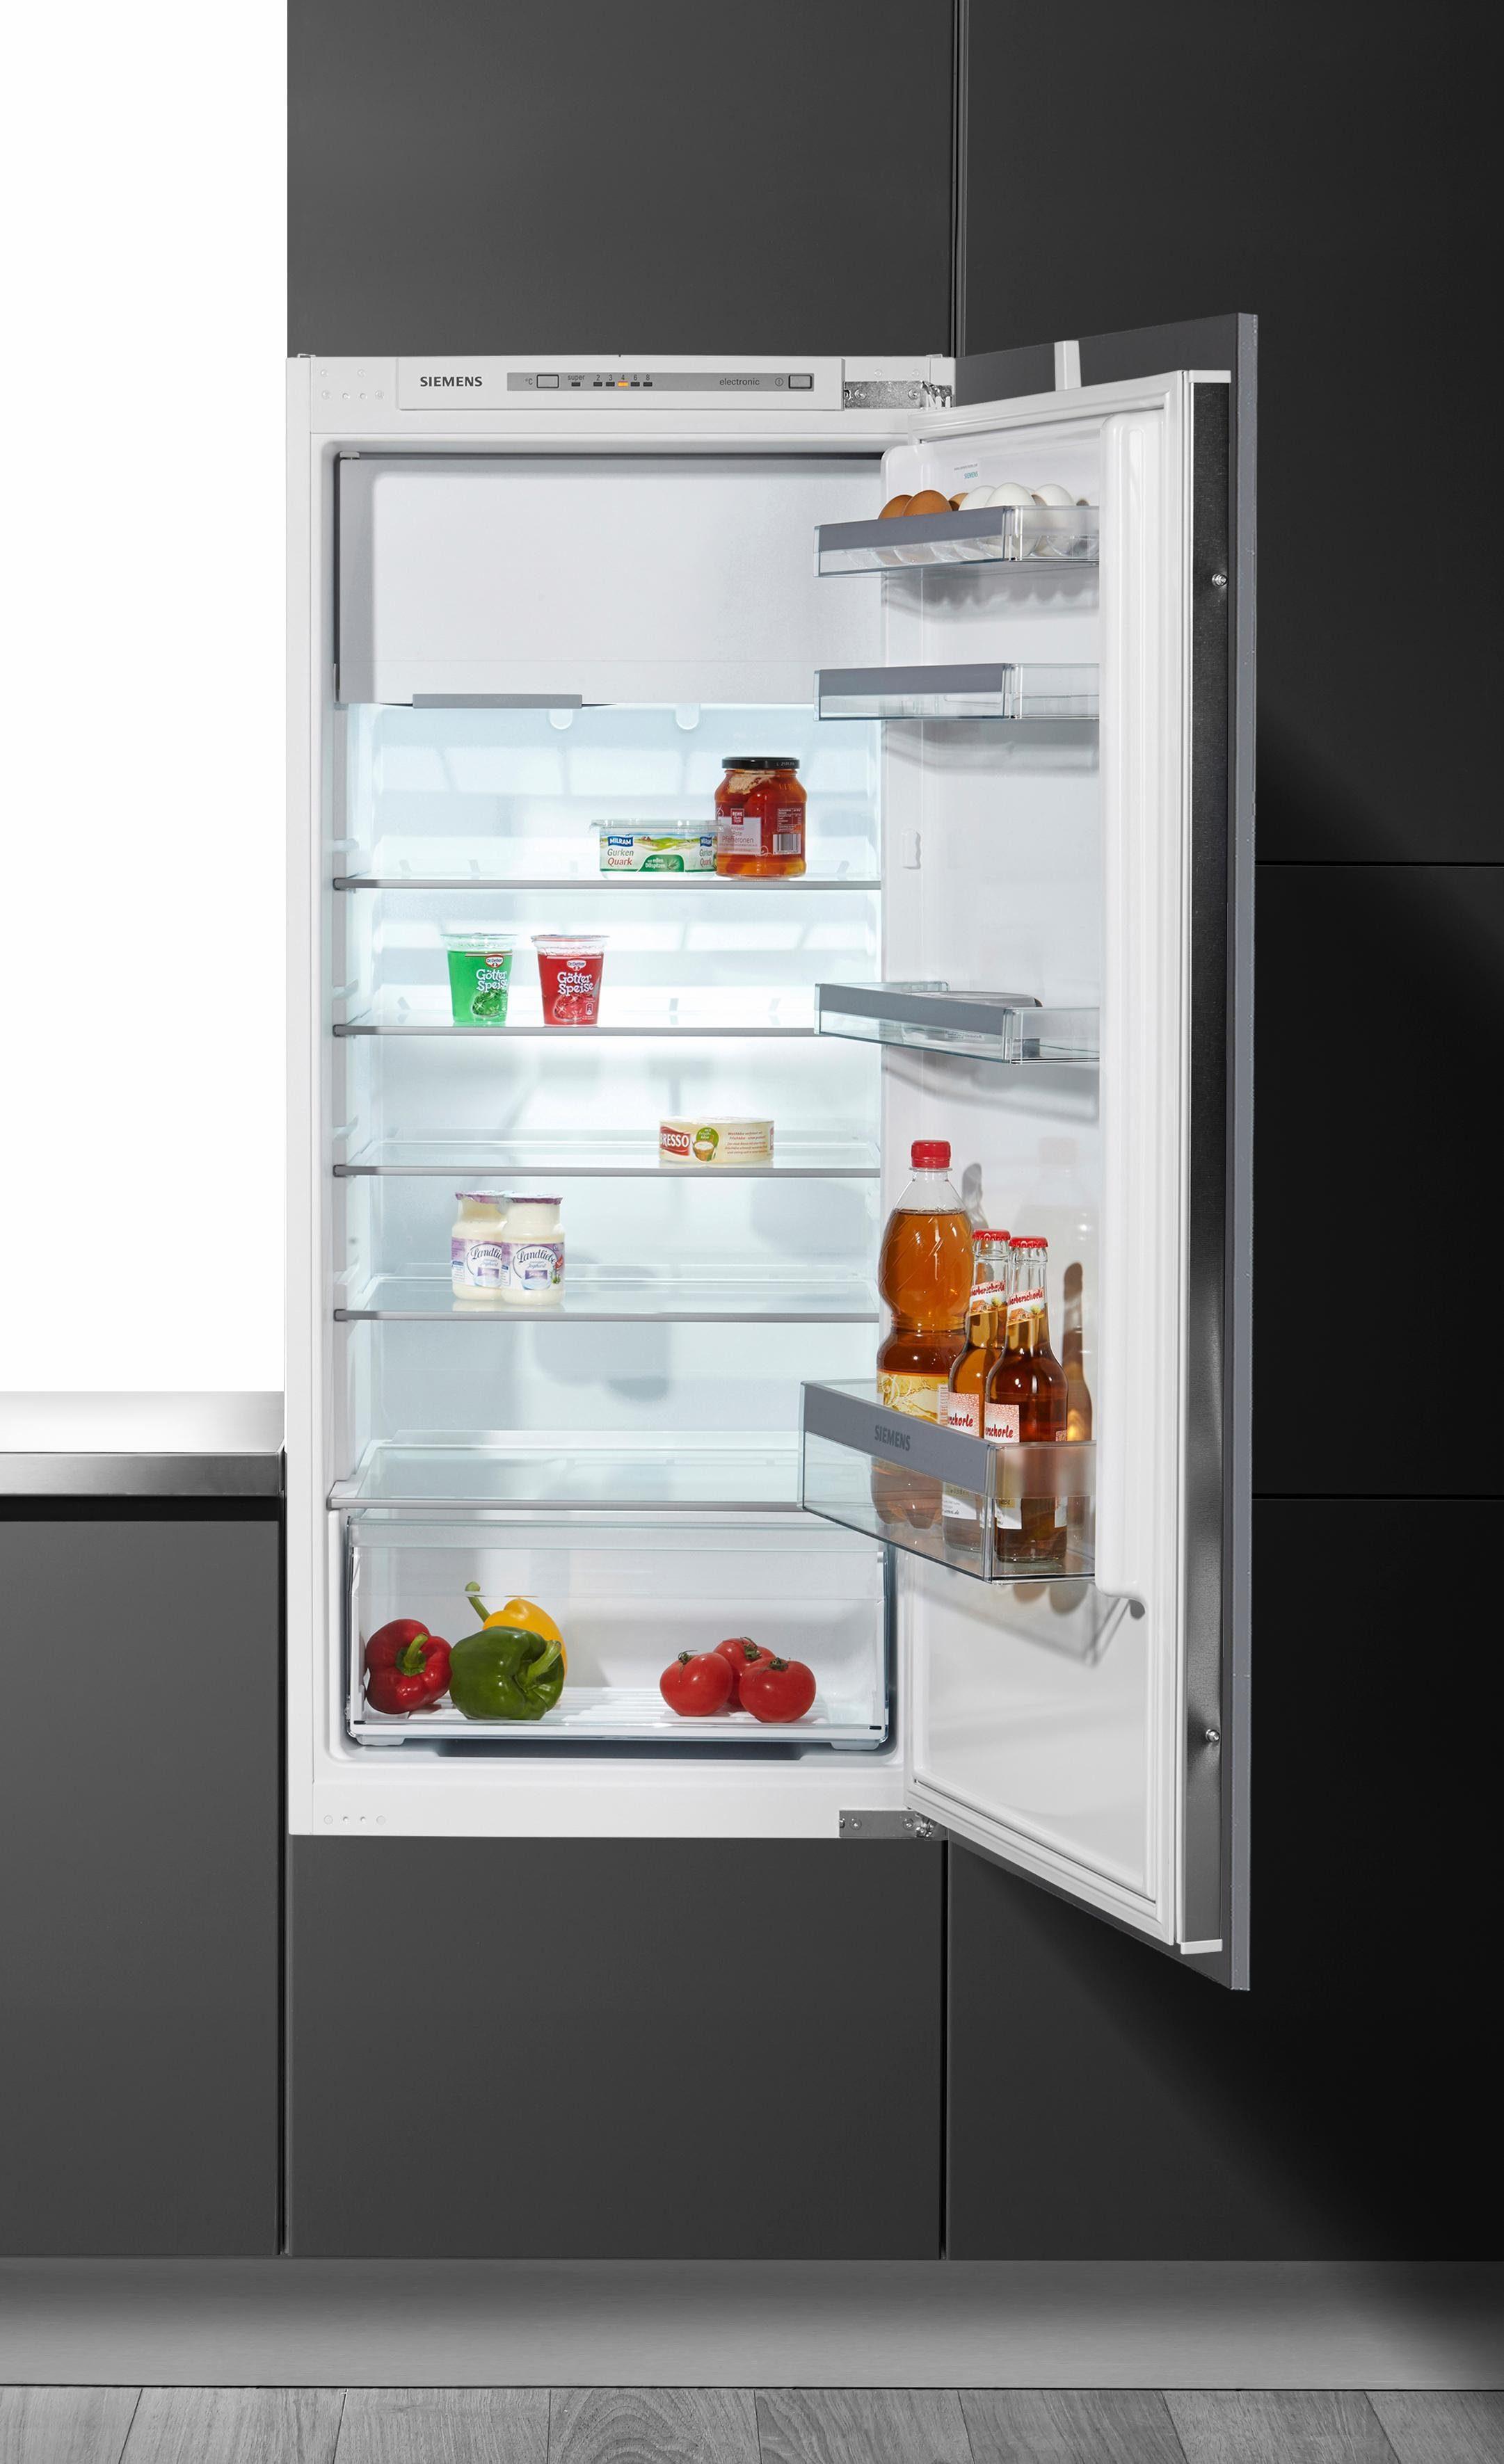 Siemens Einbau-Kühlautomat KI42LVS30, A++, 122,1 cm hoch